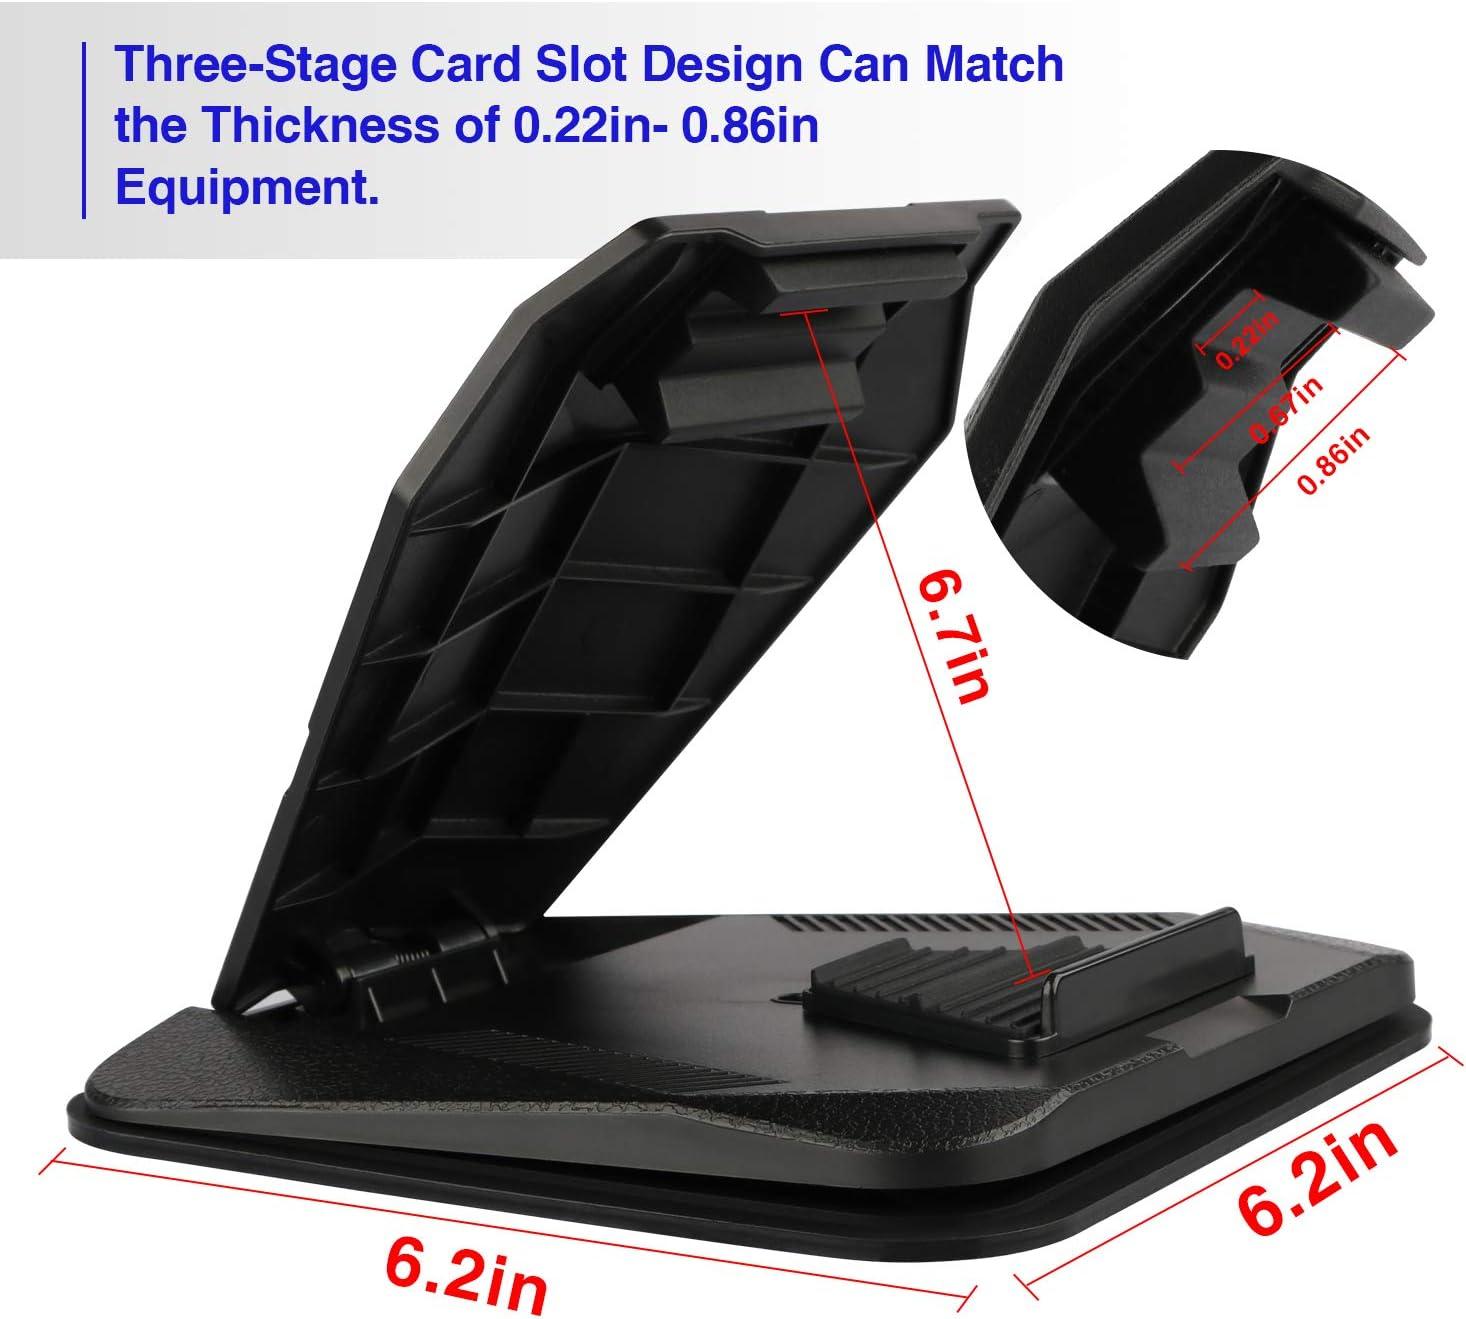 7 Cell Phone Holder for Car,Cell Phone Holder for Car Dashboard,Car Cell Phone Holder for iPhone Xs Max XR X 8 8 Samsung Galaxy Note10 9 S10 S9 S8 Garmin Nuvi,Tomtom,Via GO,iPad Mini.